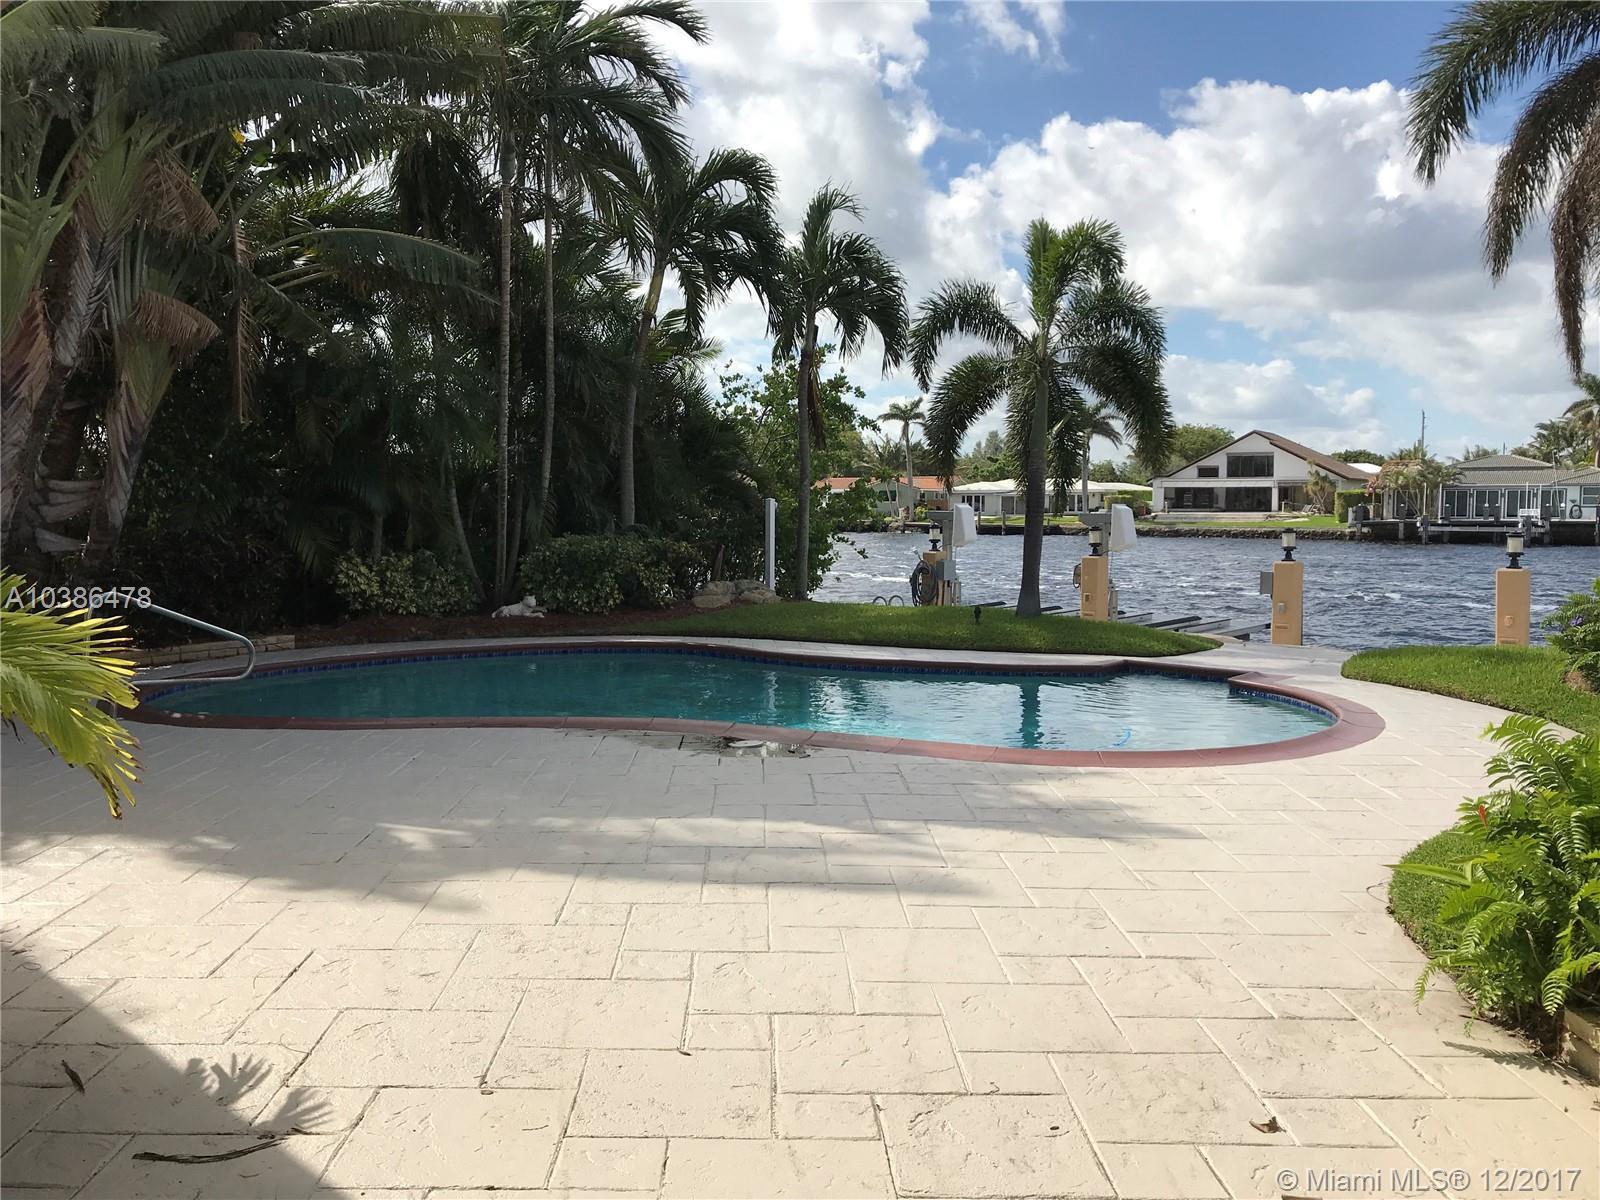 513 S Riverside Dr, Pompano Beach FL, 33062